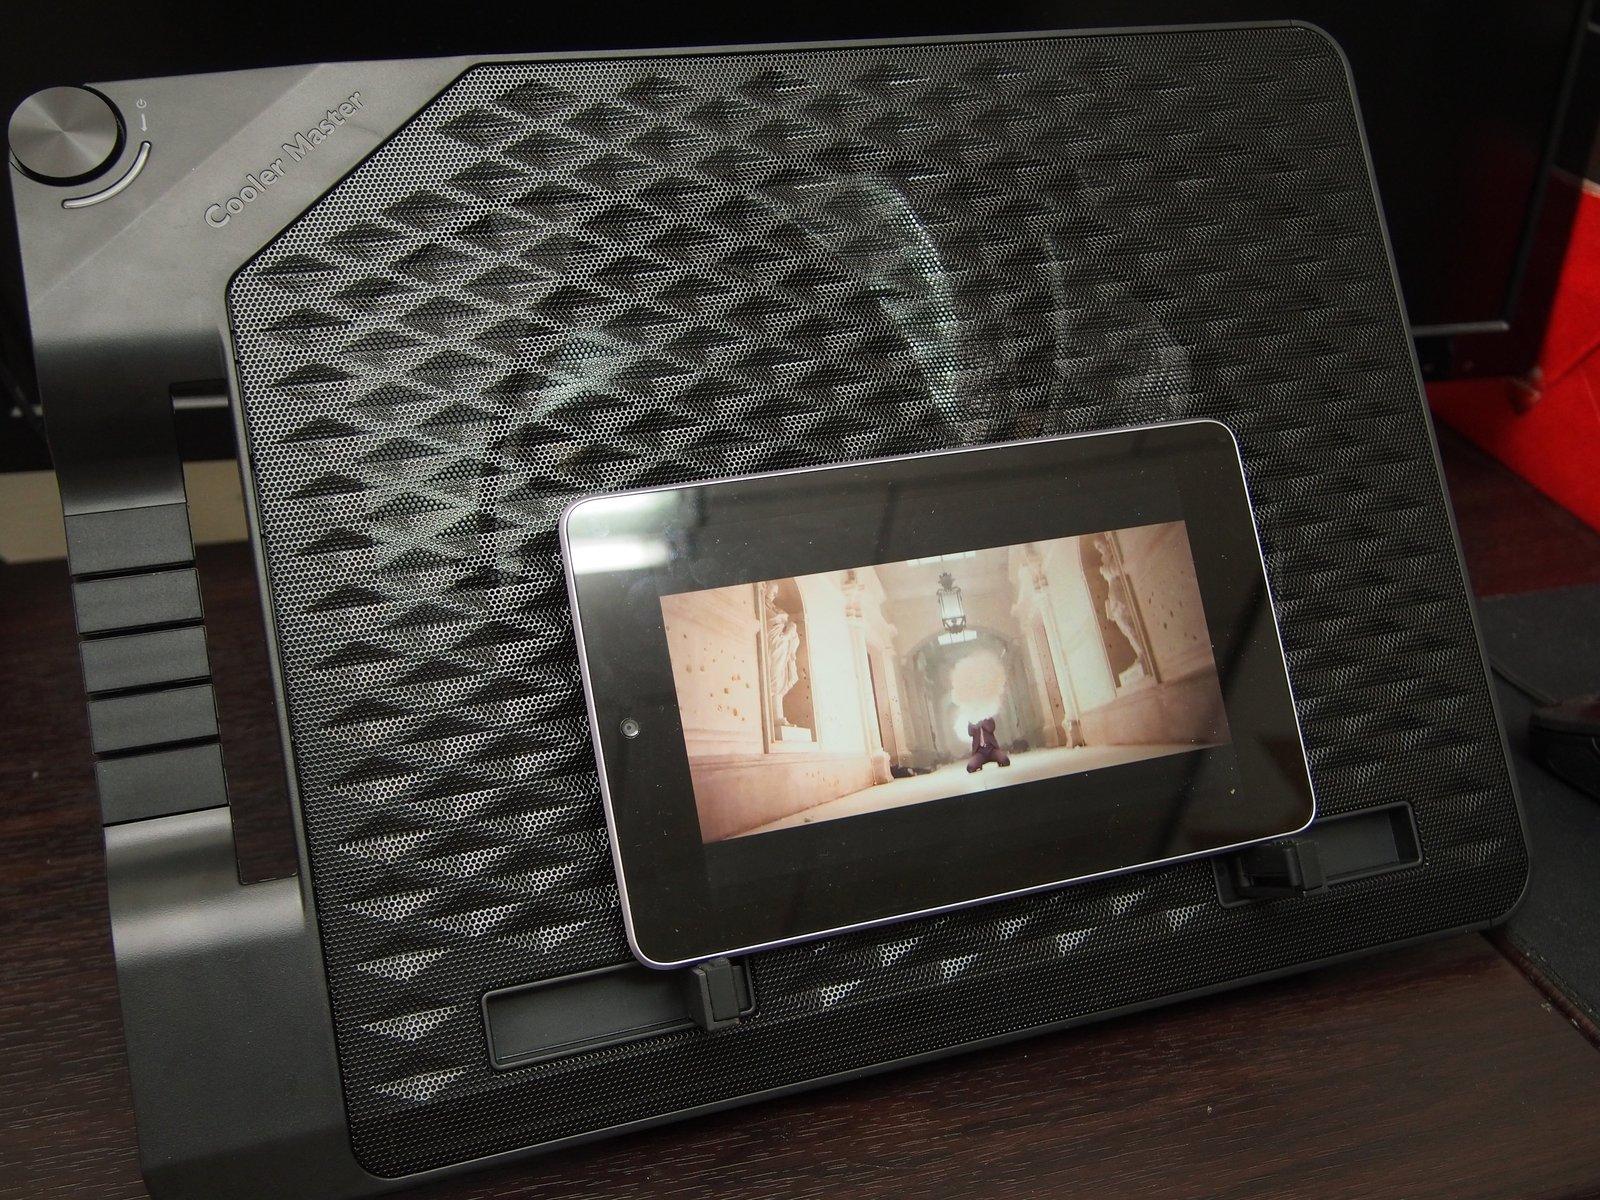 [XF] 大風扇加持,筆電平板都適用 Cooler Master ErgoStand III 散熱架